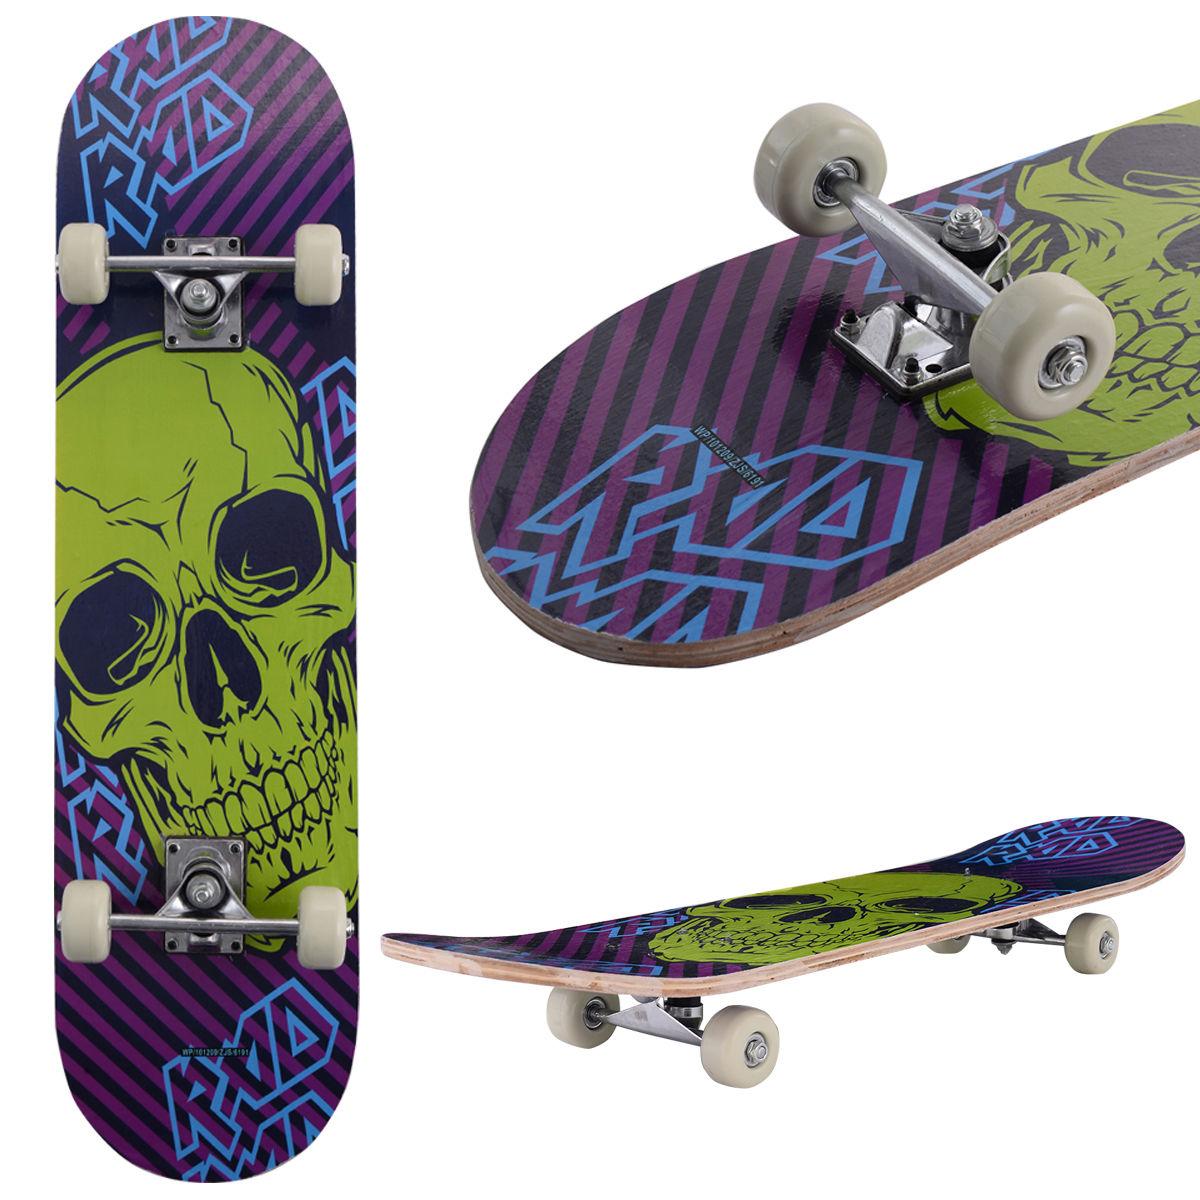 Costway 31'' x 8'' Professional Kids Skateboard Complete Wheel Trucks Maple Deck Wood Gift